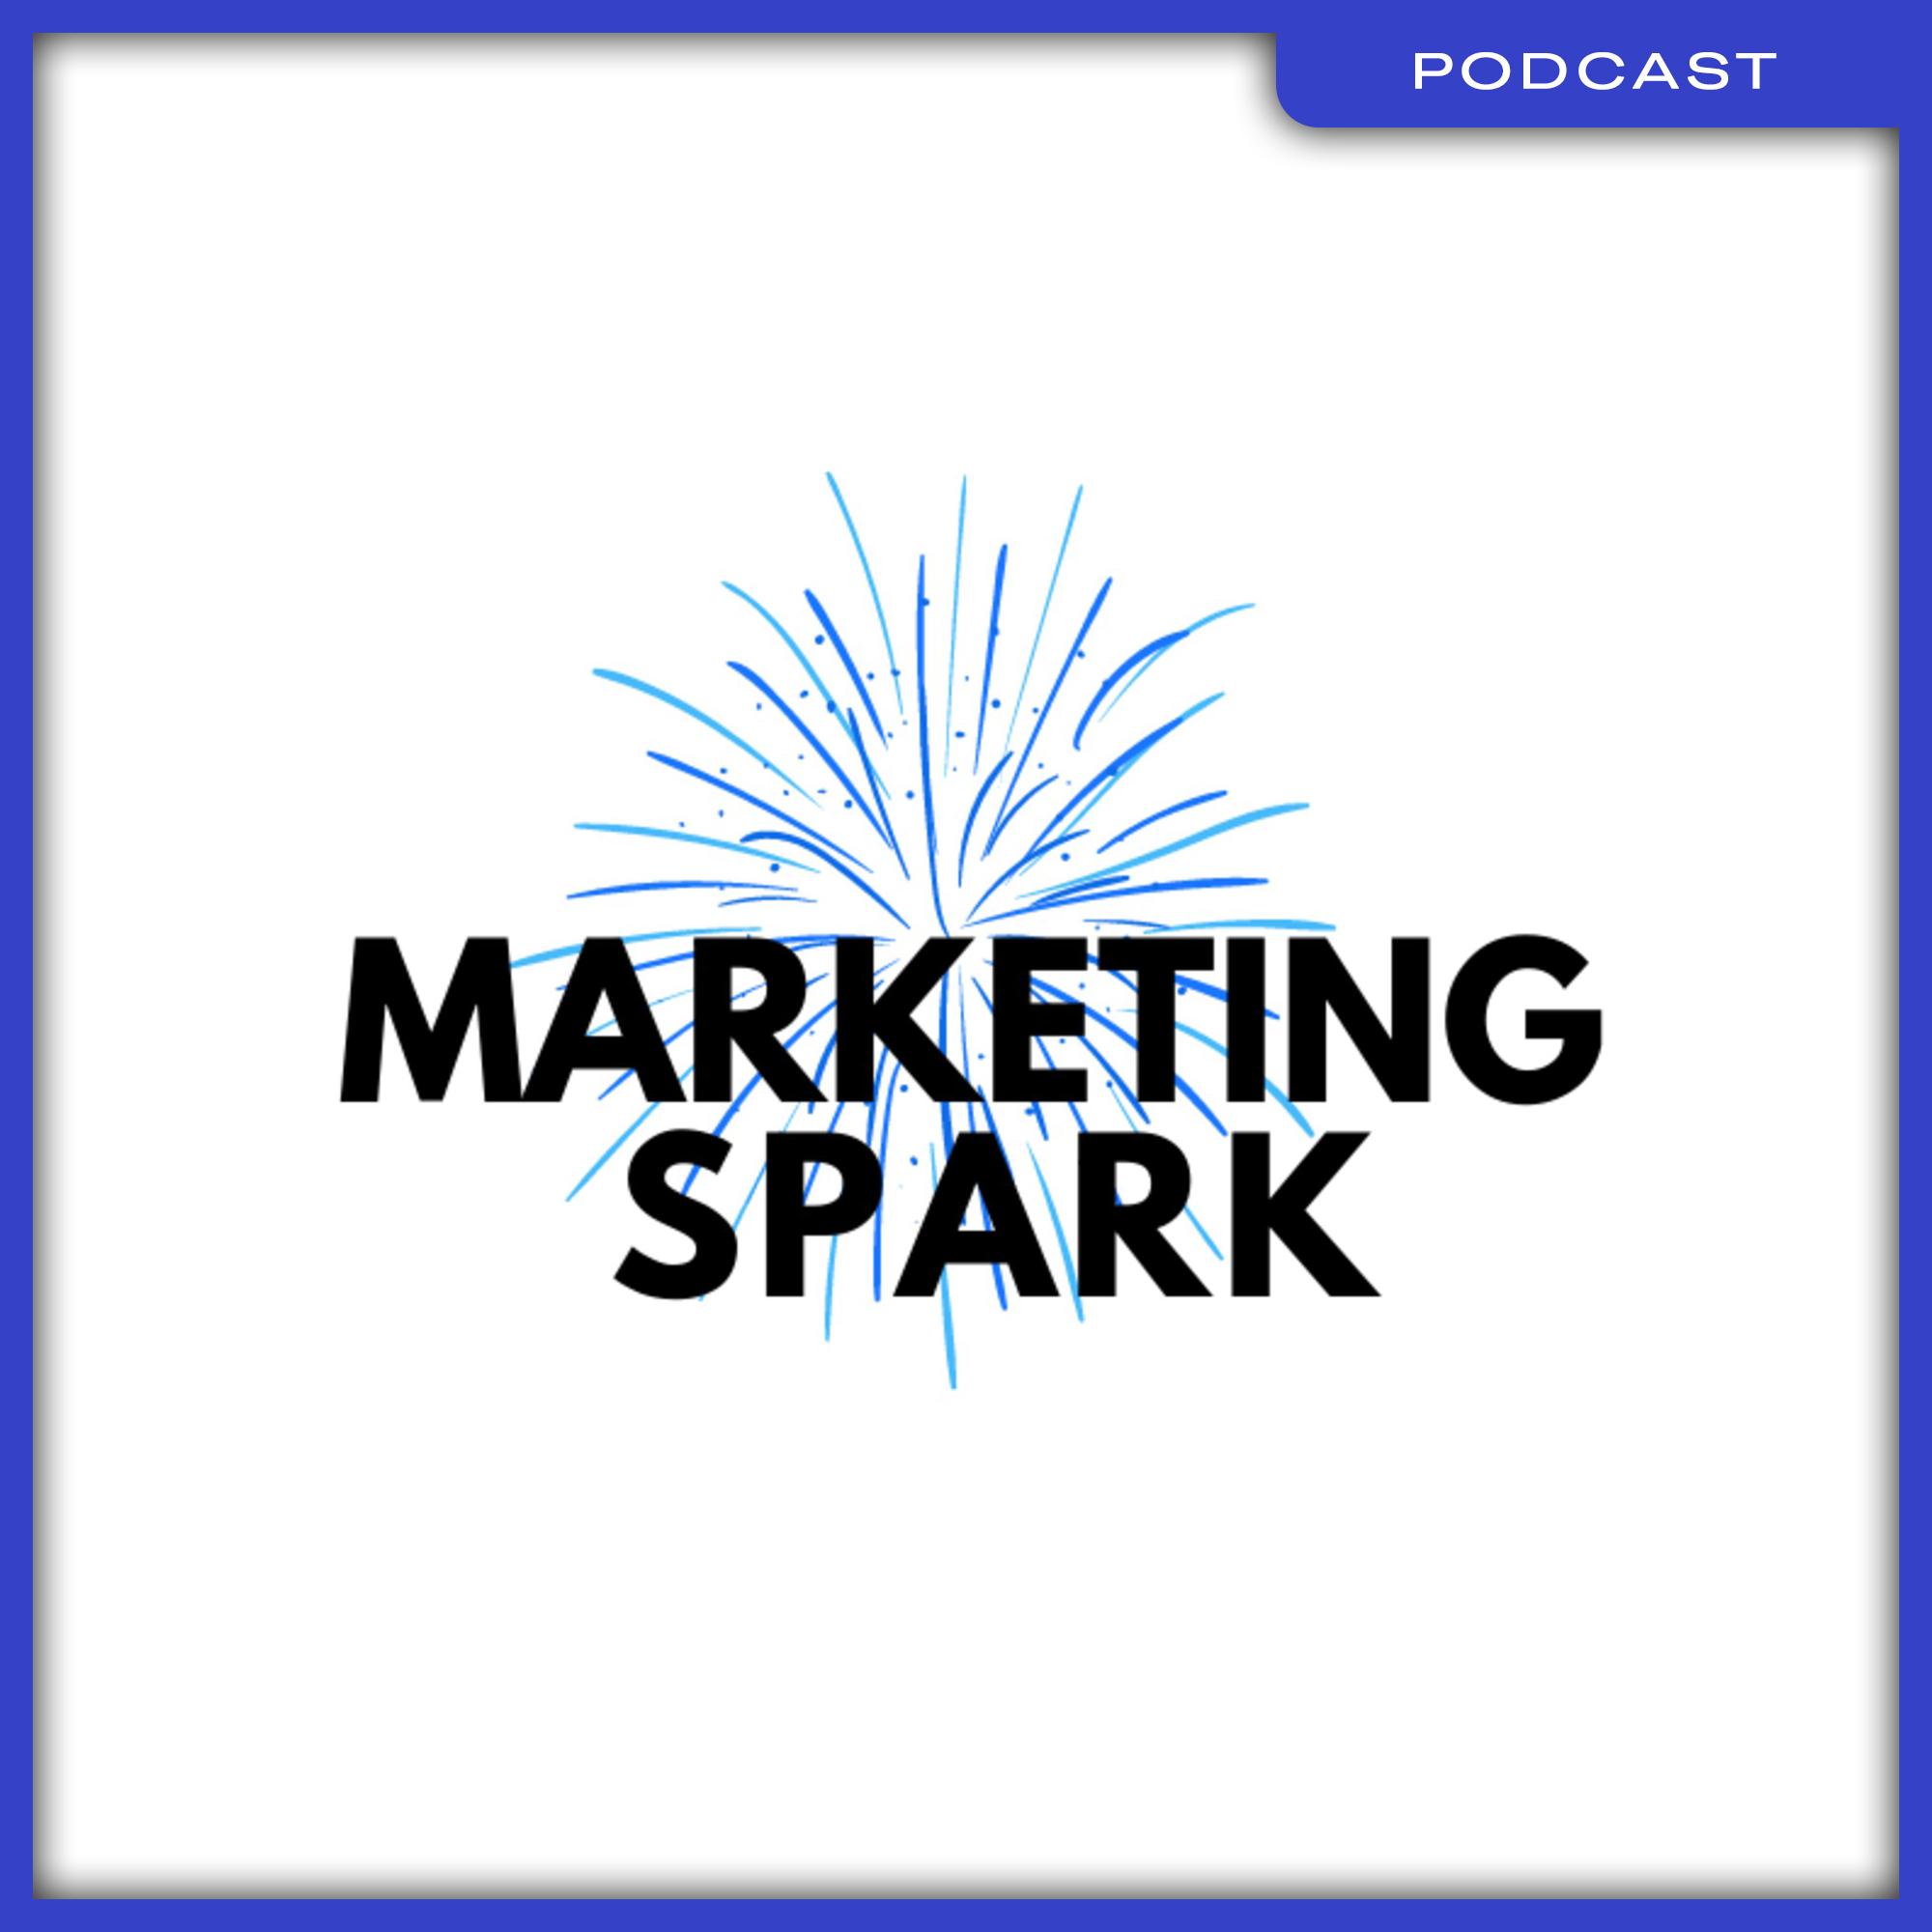 15_Podcast_MarketingSpark